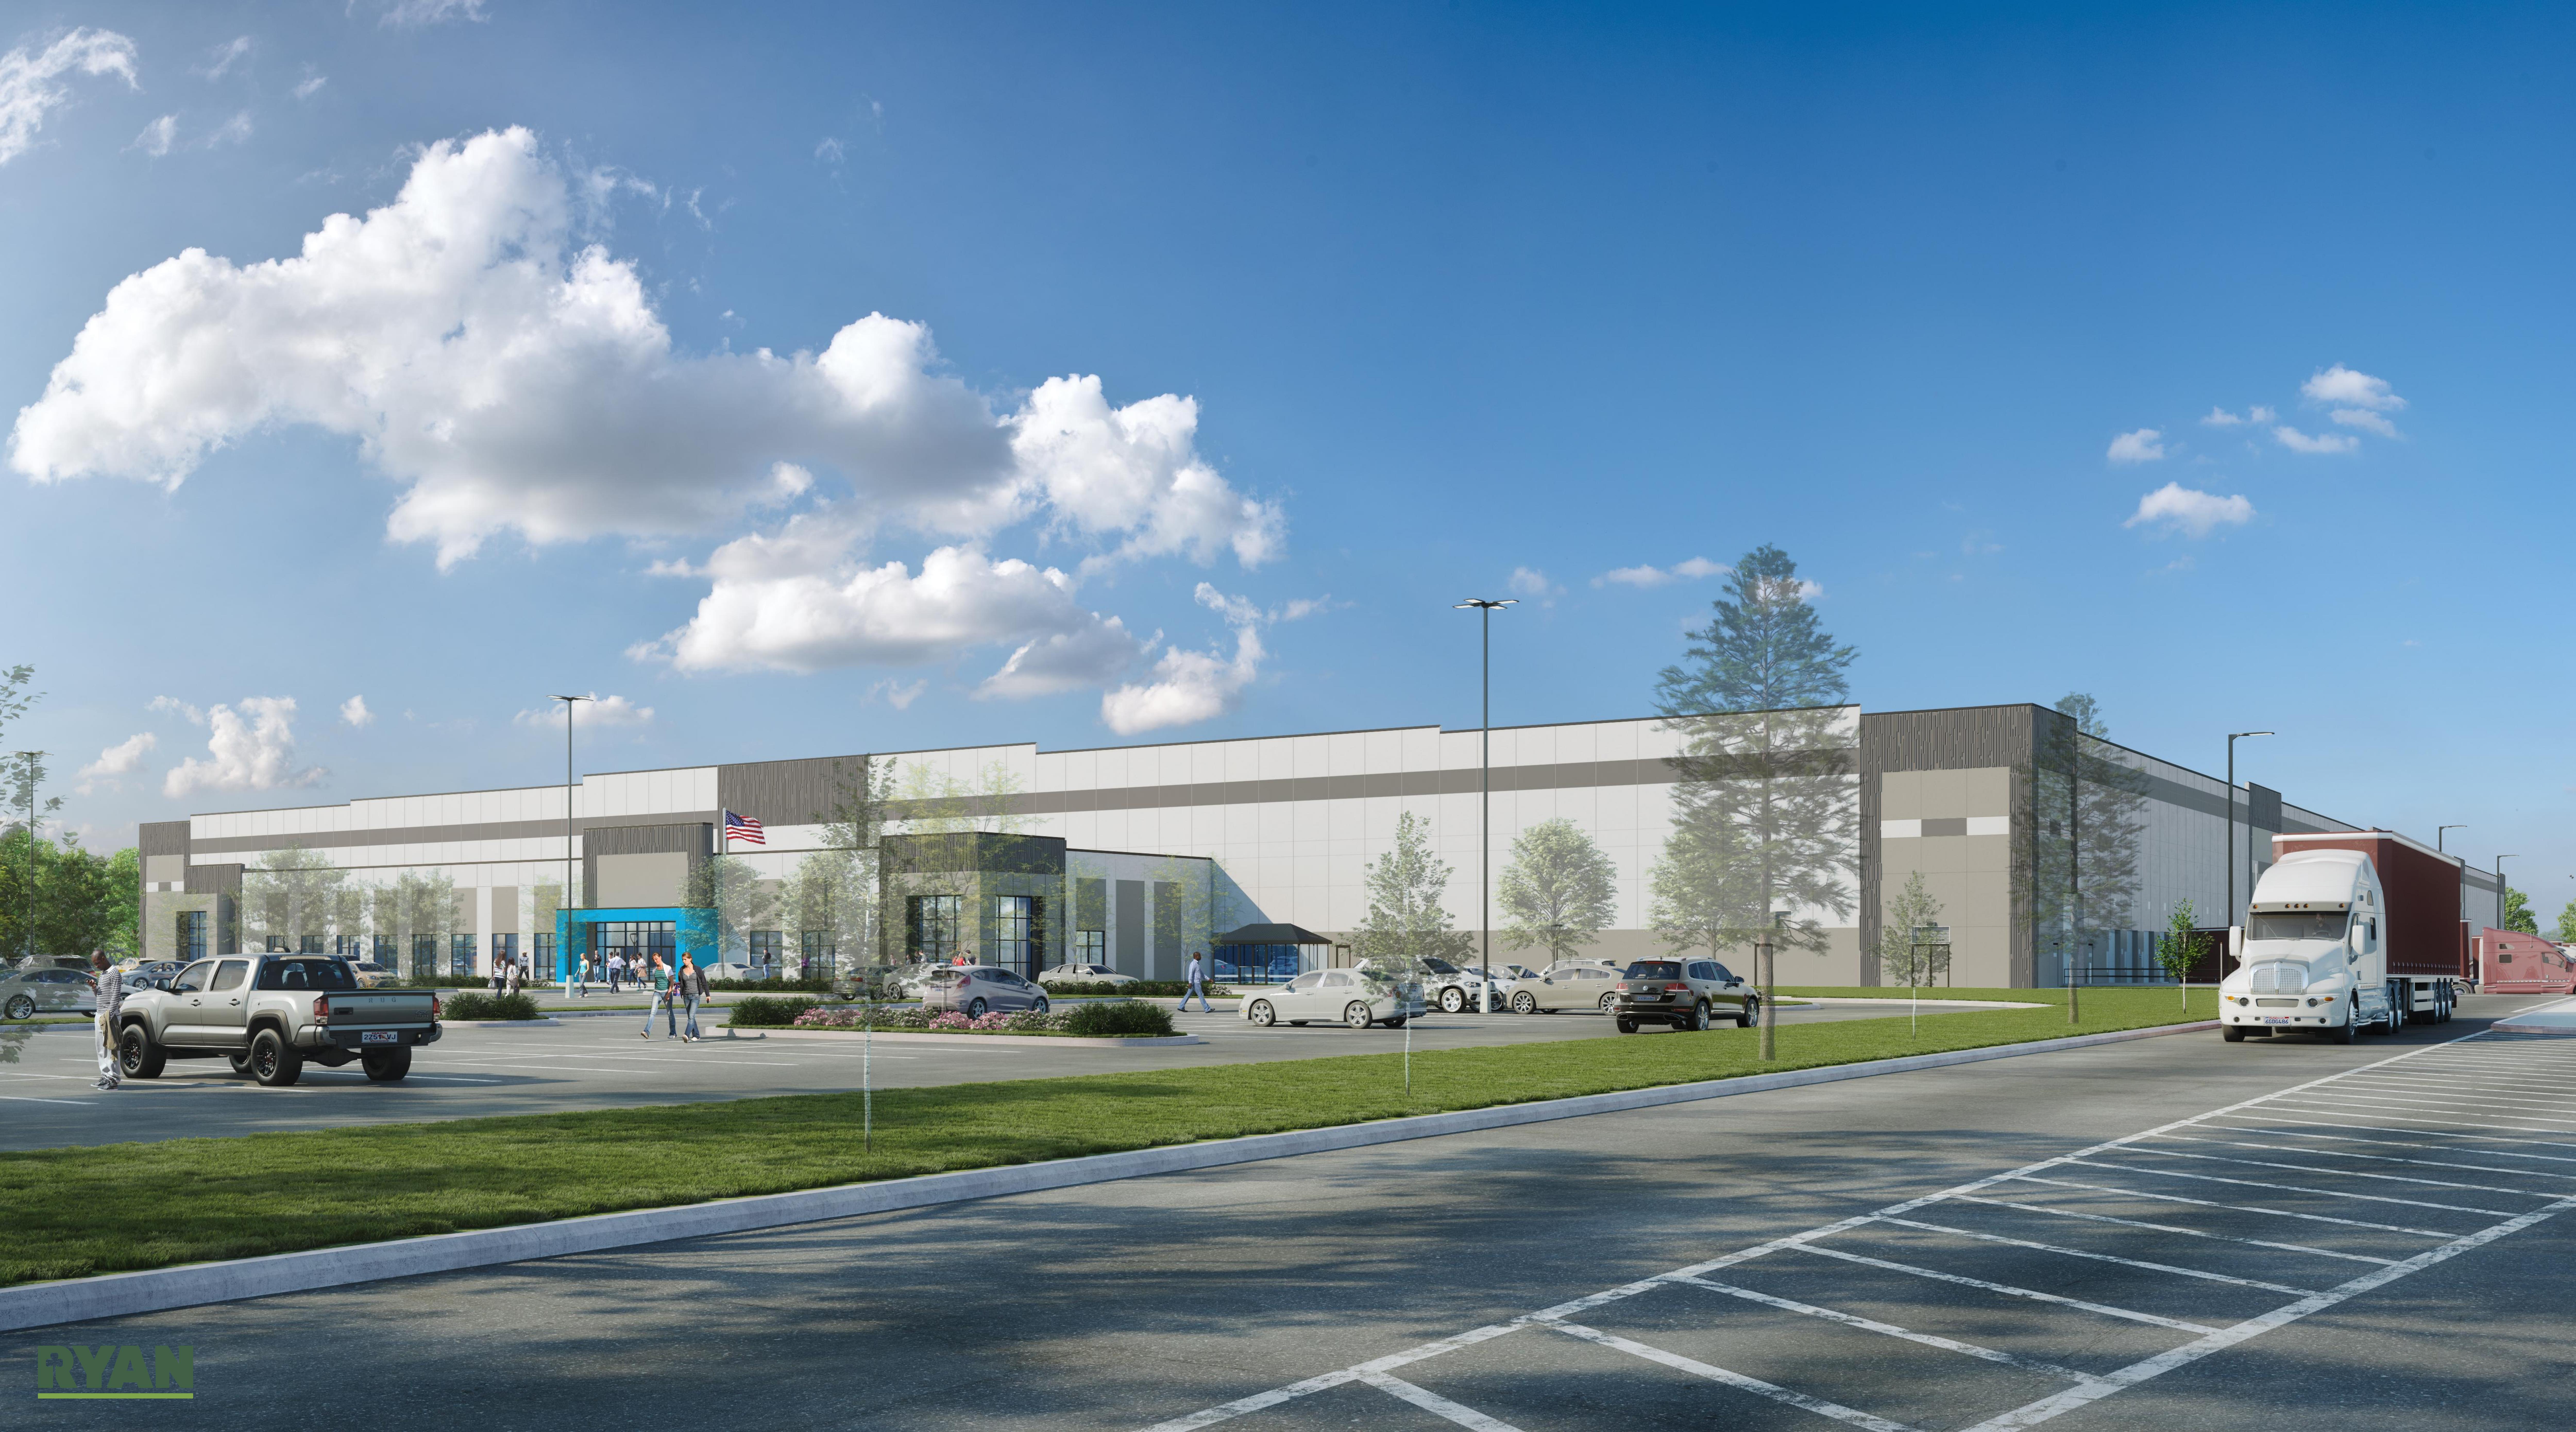 Amazon is Rumored Tenant for New Woodbury Warehouse